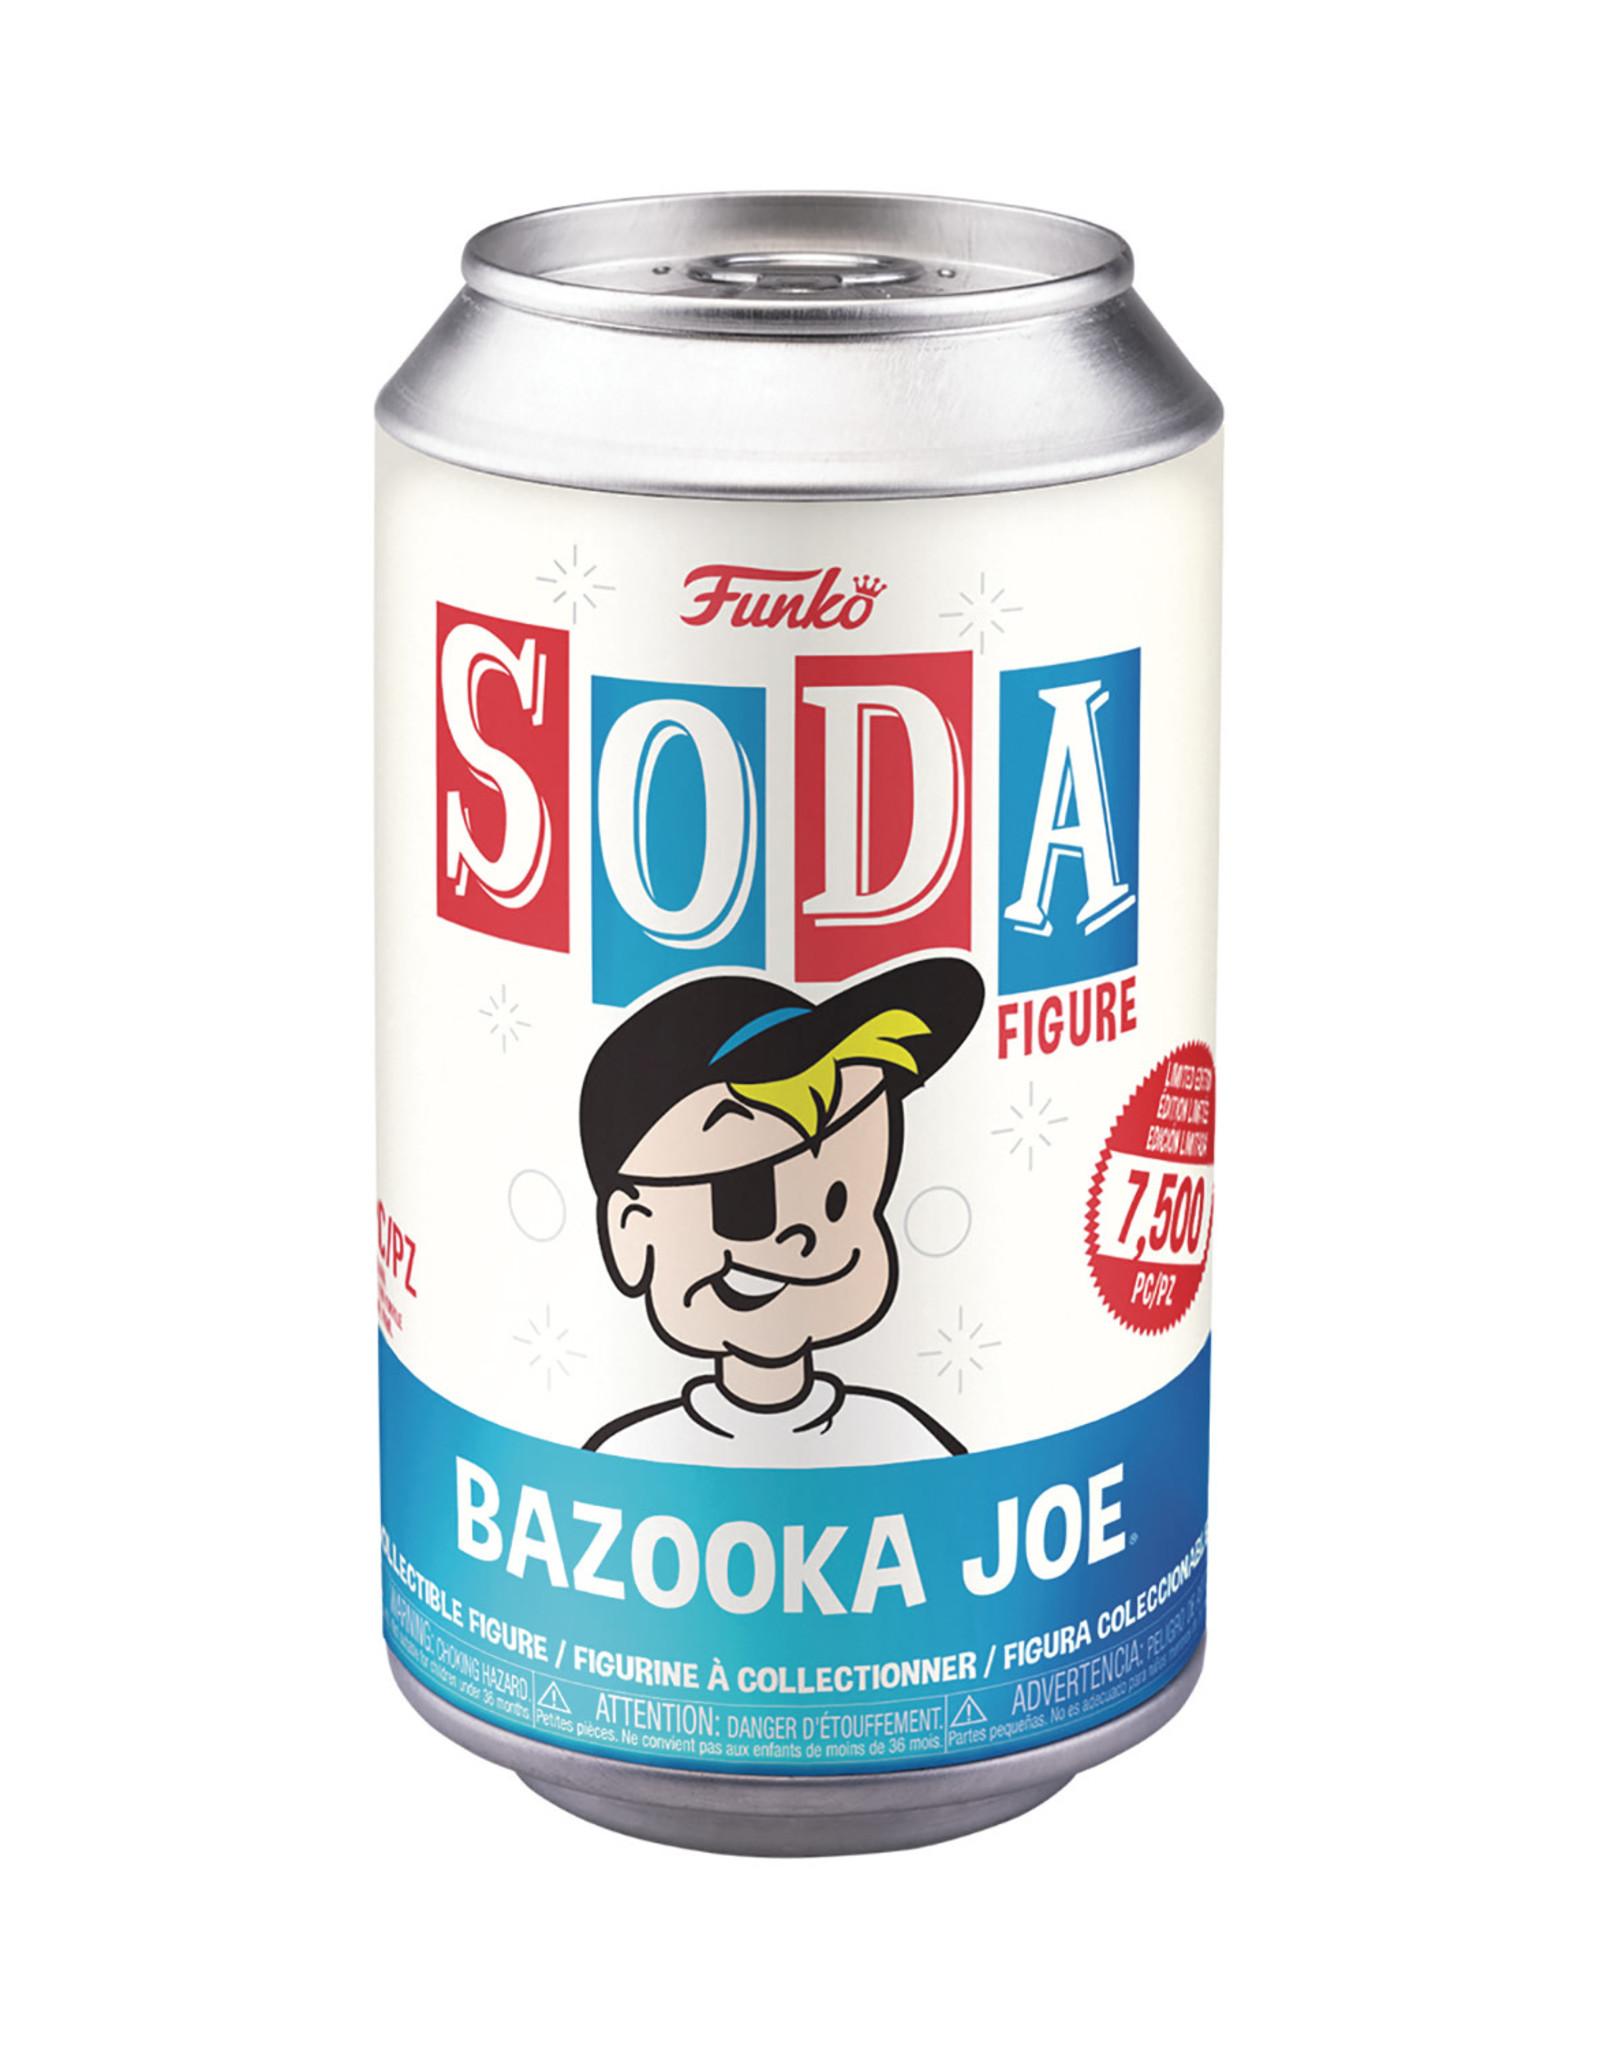 Funko Vinyl Soda Bazooka Joe